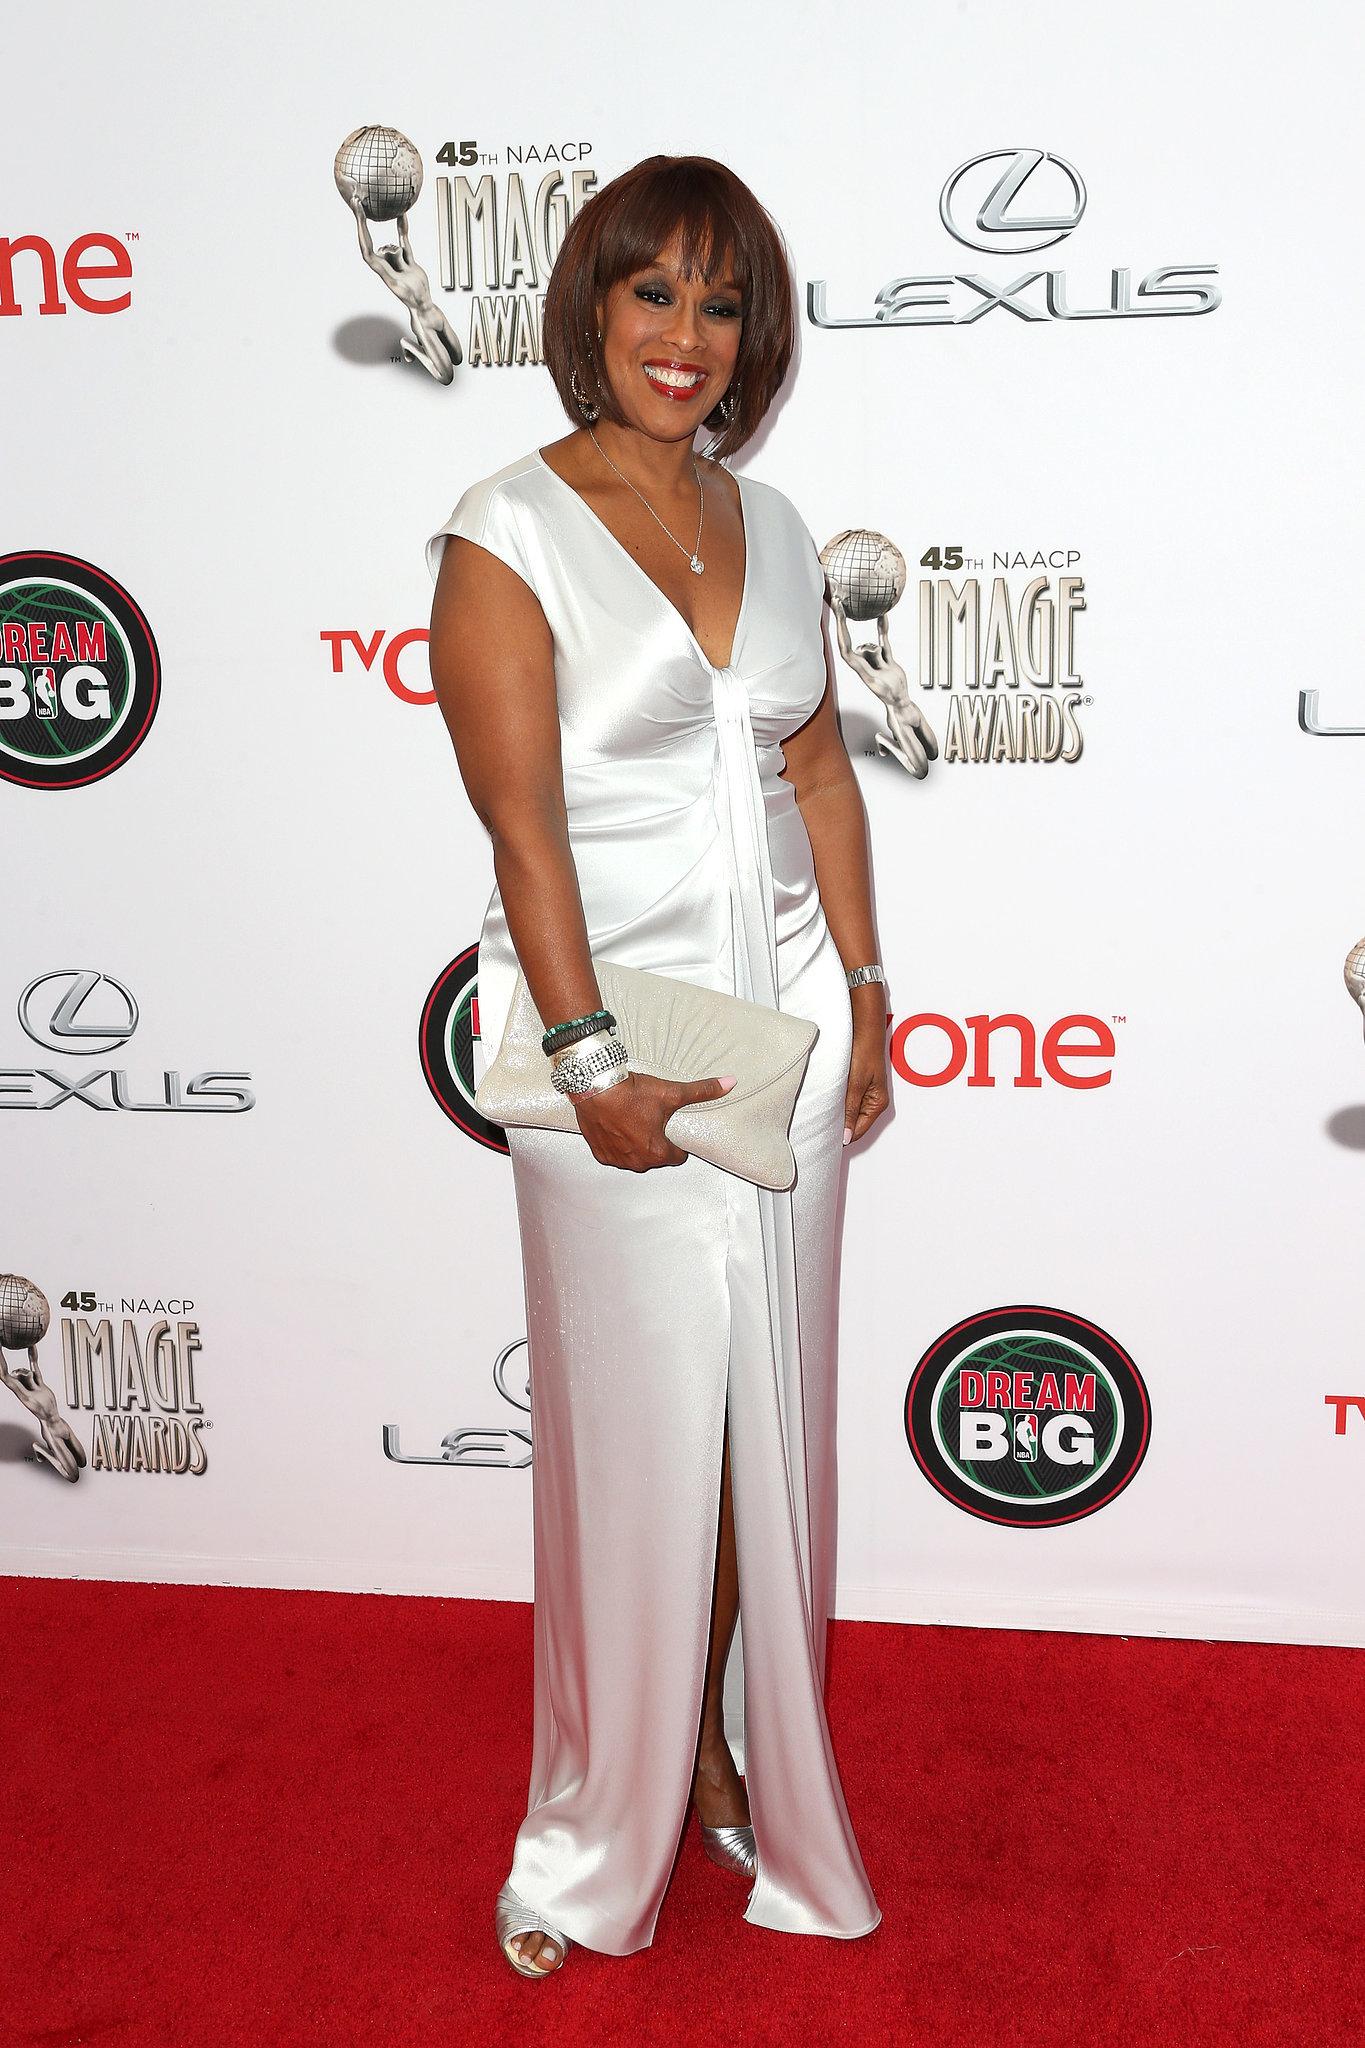 Gayle King showed up to support pal Oprah.